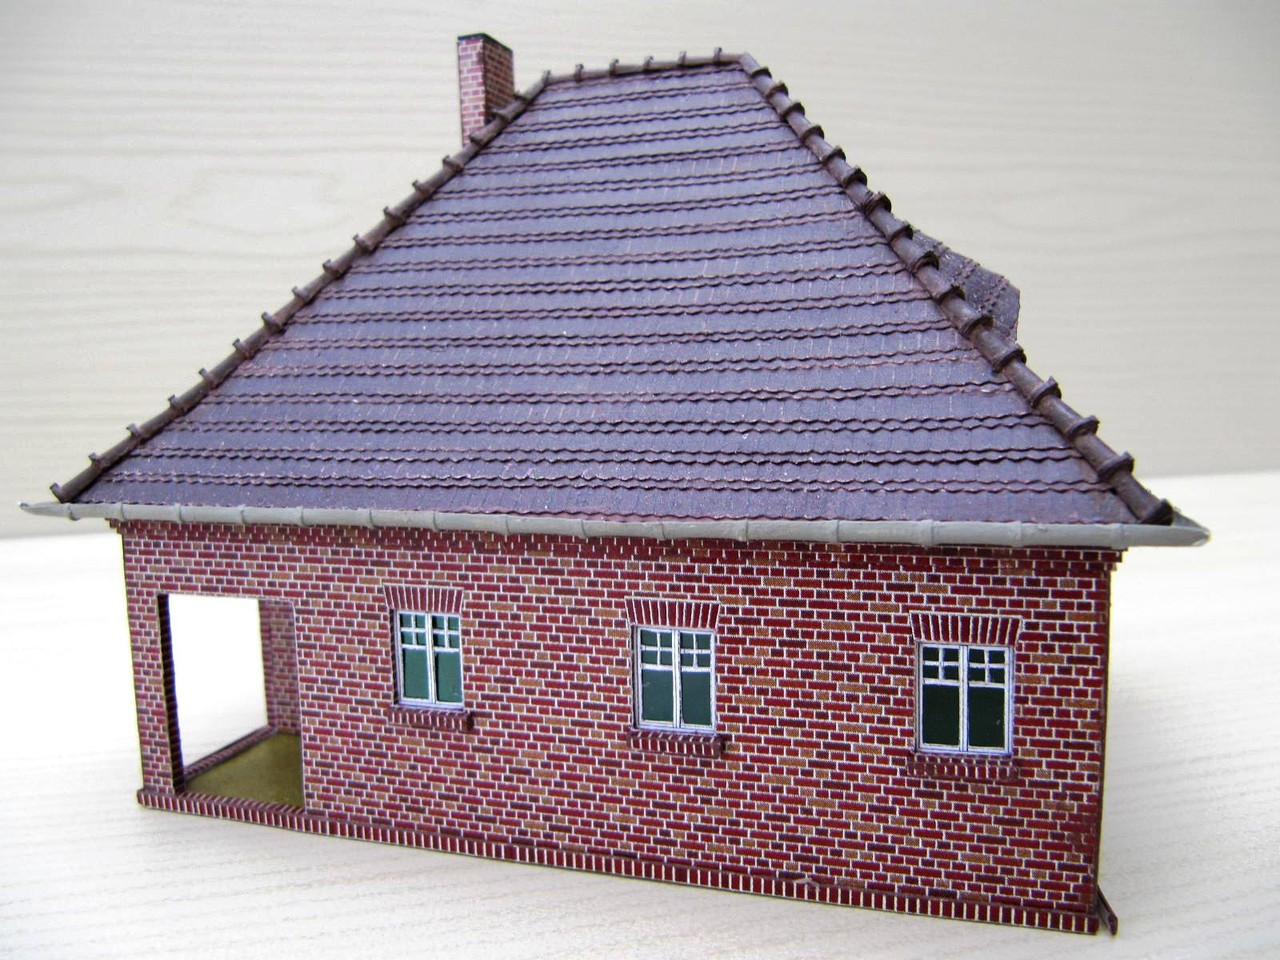 (c) W. Fehse - Biberschwanz-Dach 1:87 (H0)